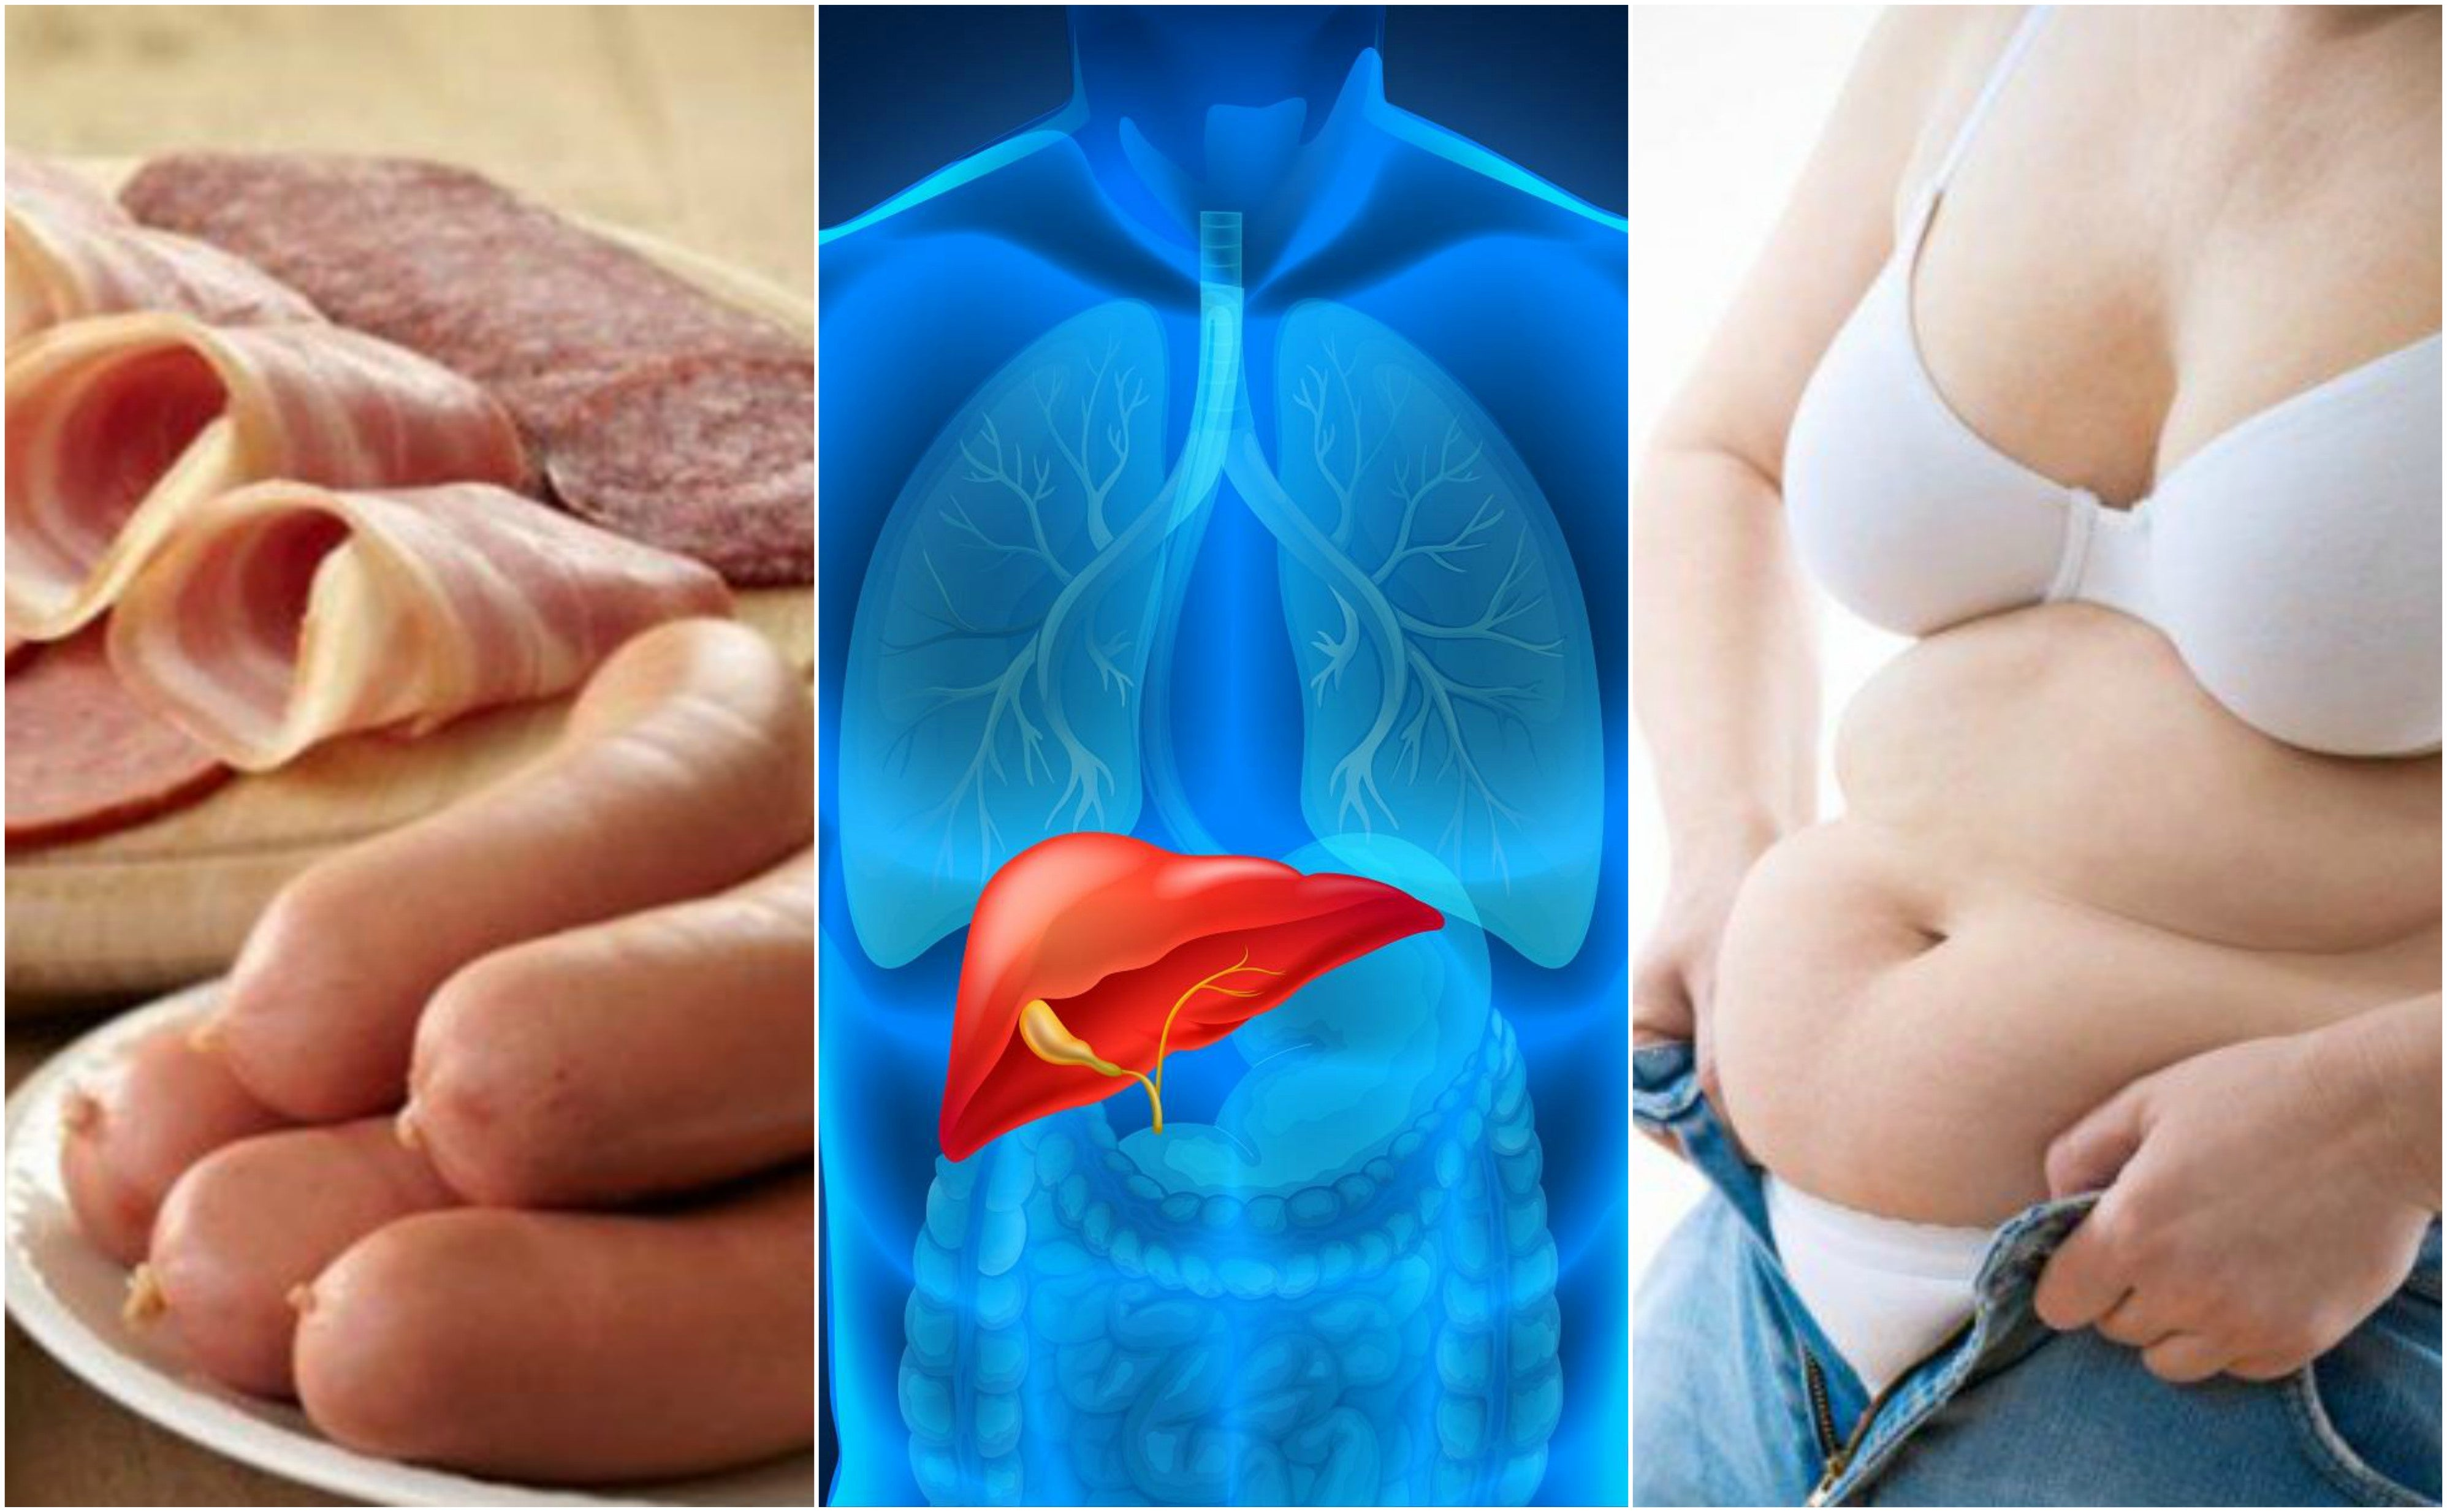 7 cosas que afectan la salud del hígado sin beber alcohol